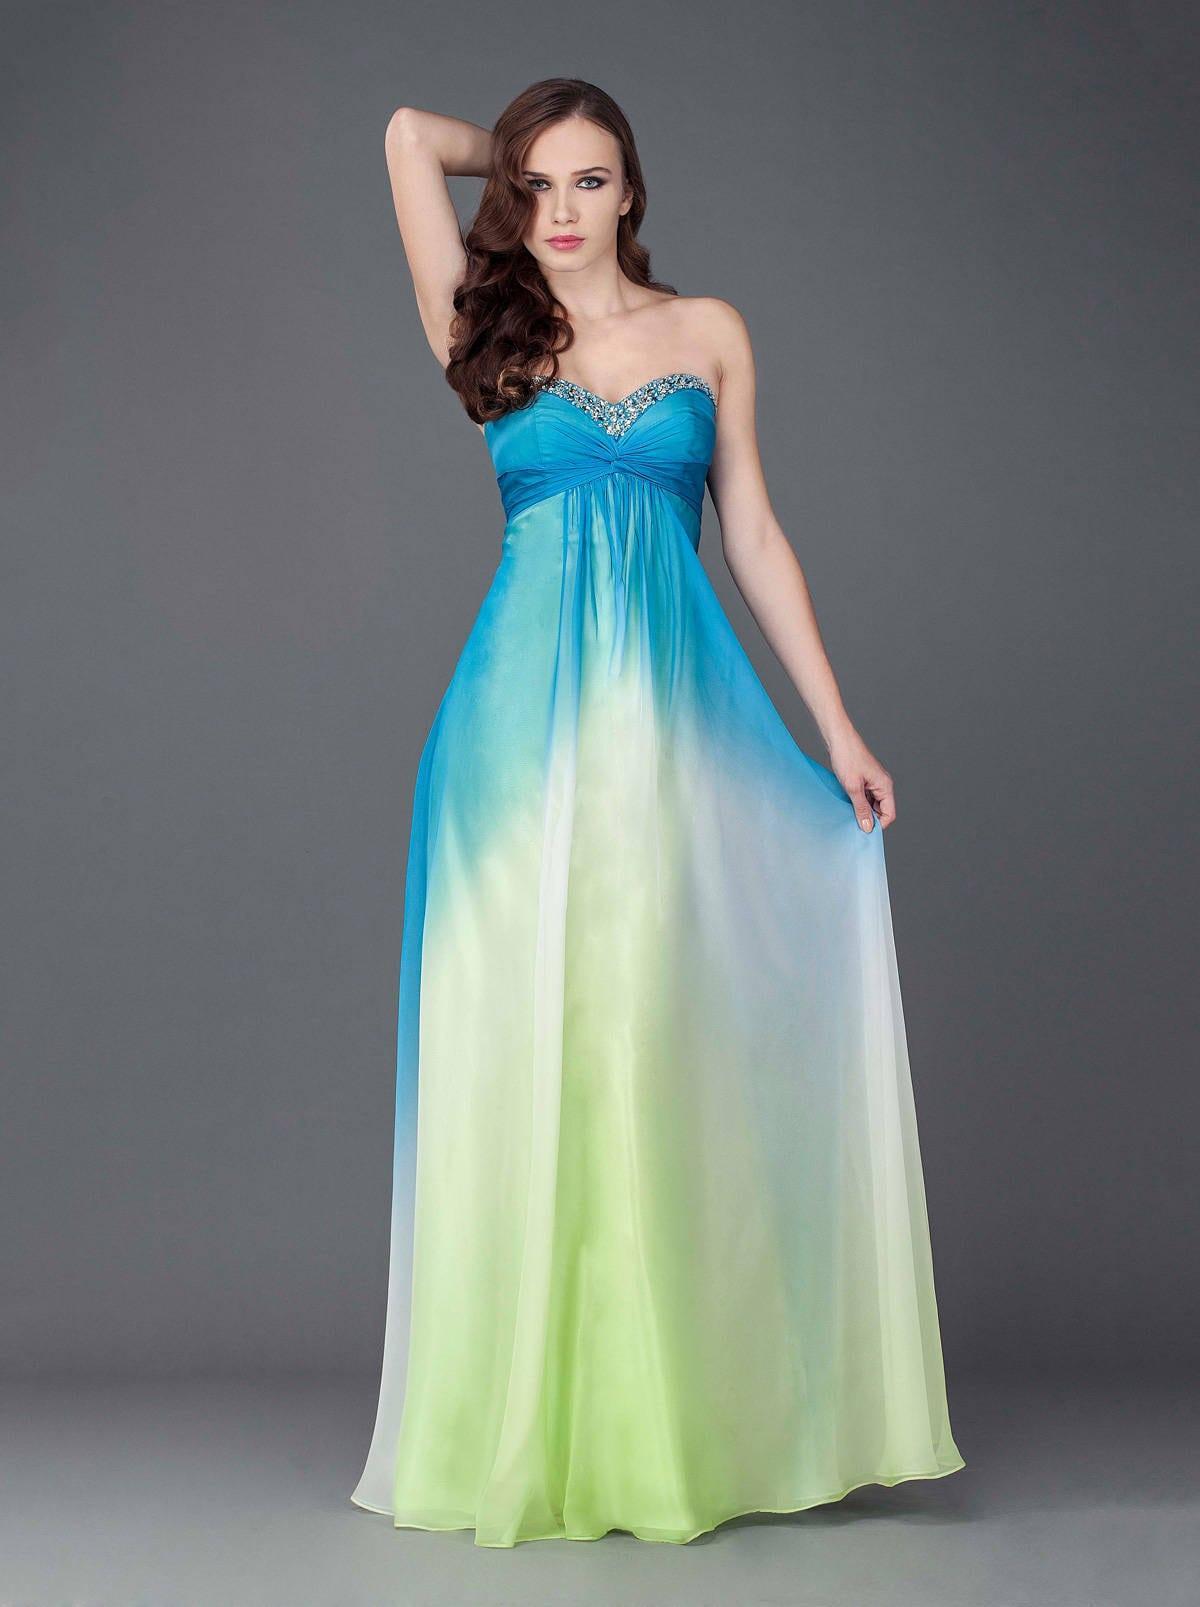 Printed Evening Dresses - Darius Cordell Fashion Ltd